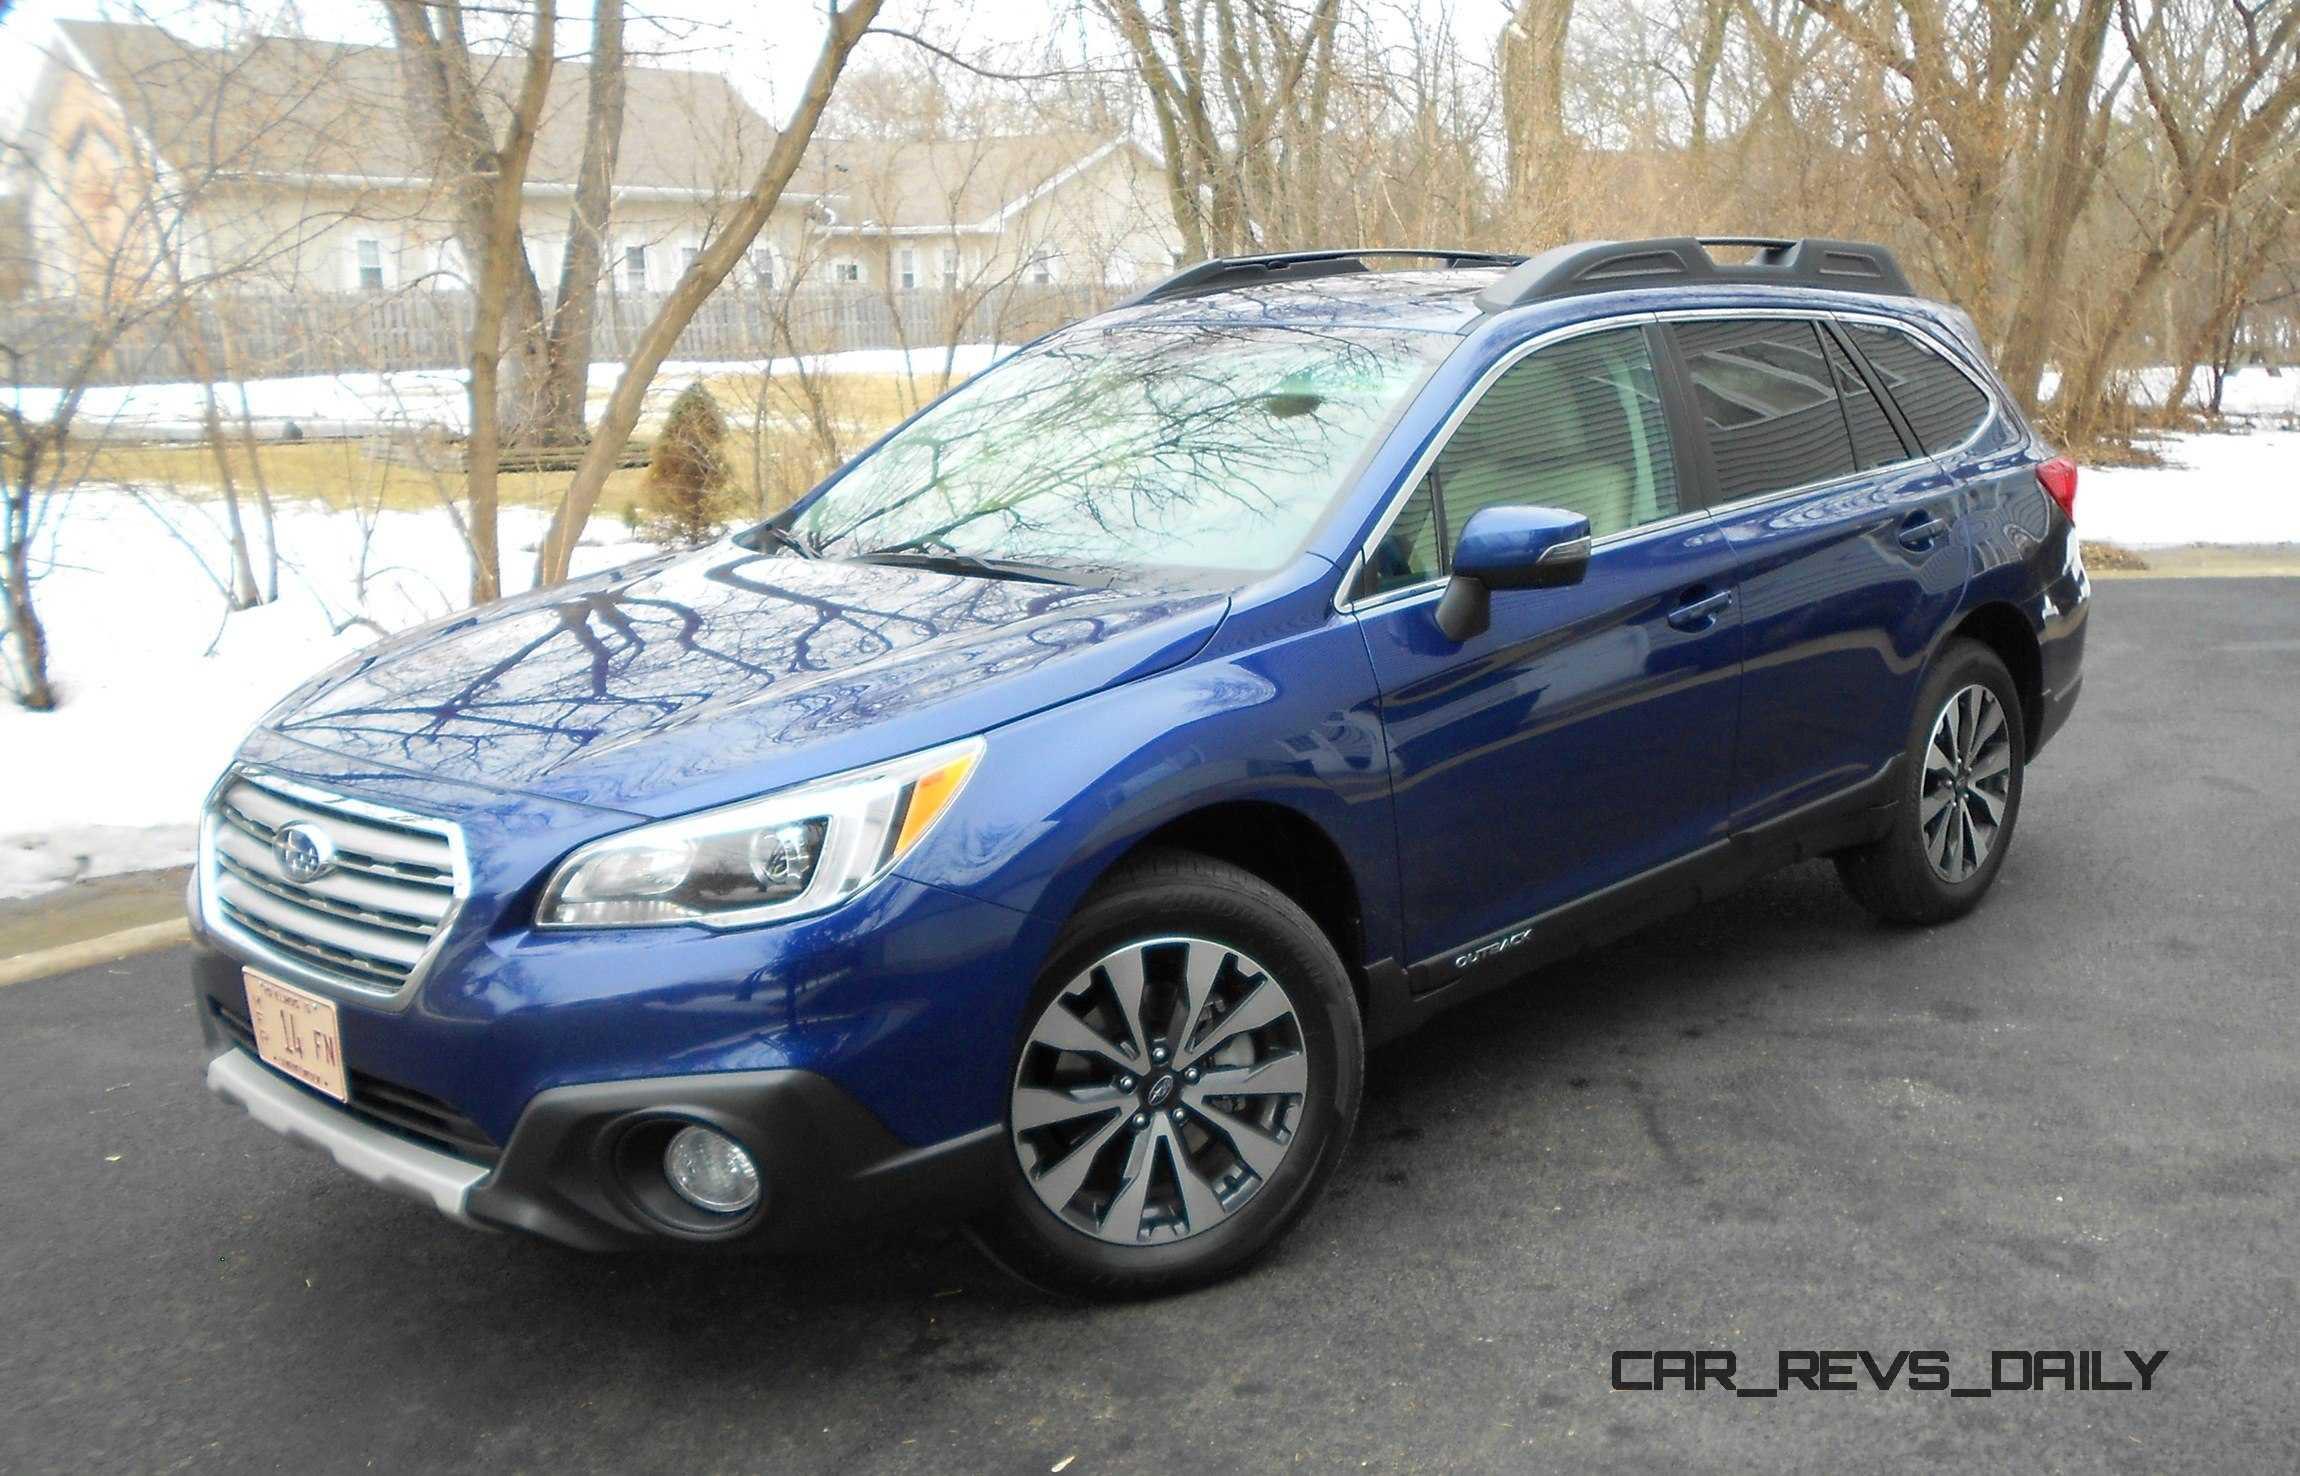 2018 subaru outback blue. Exellent Blue 2015 Subaru Outback Limited 2  Intended 2018 Subaru Outback Blue T